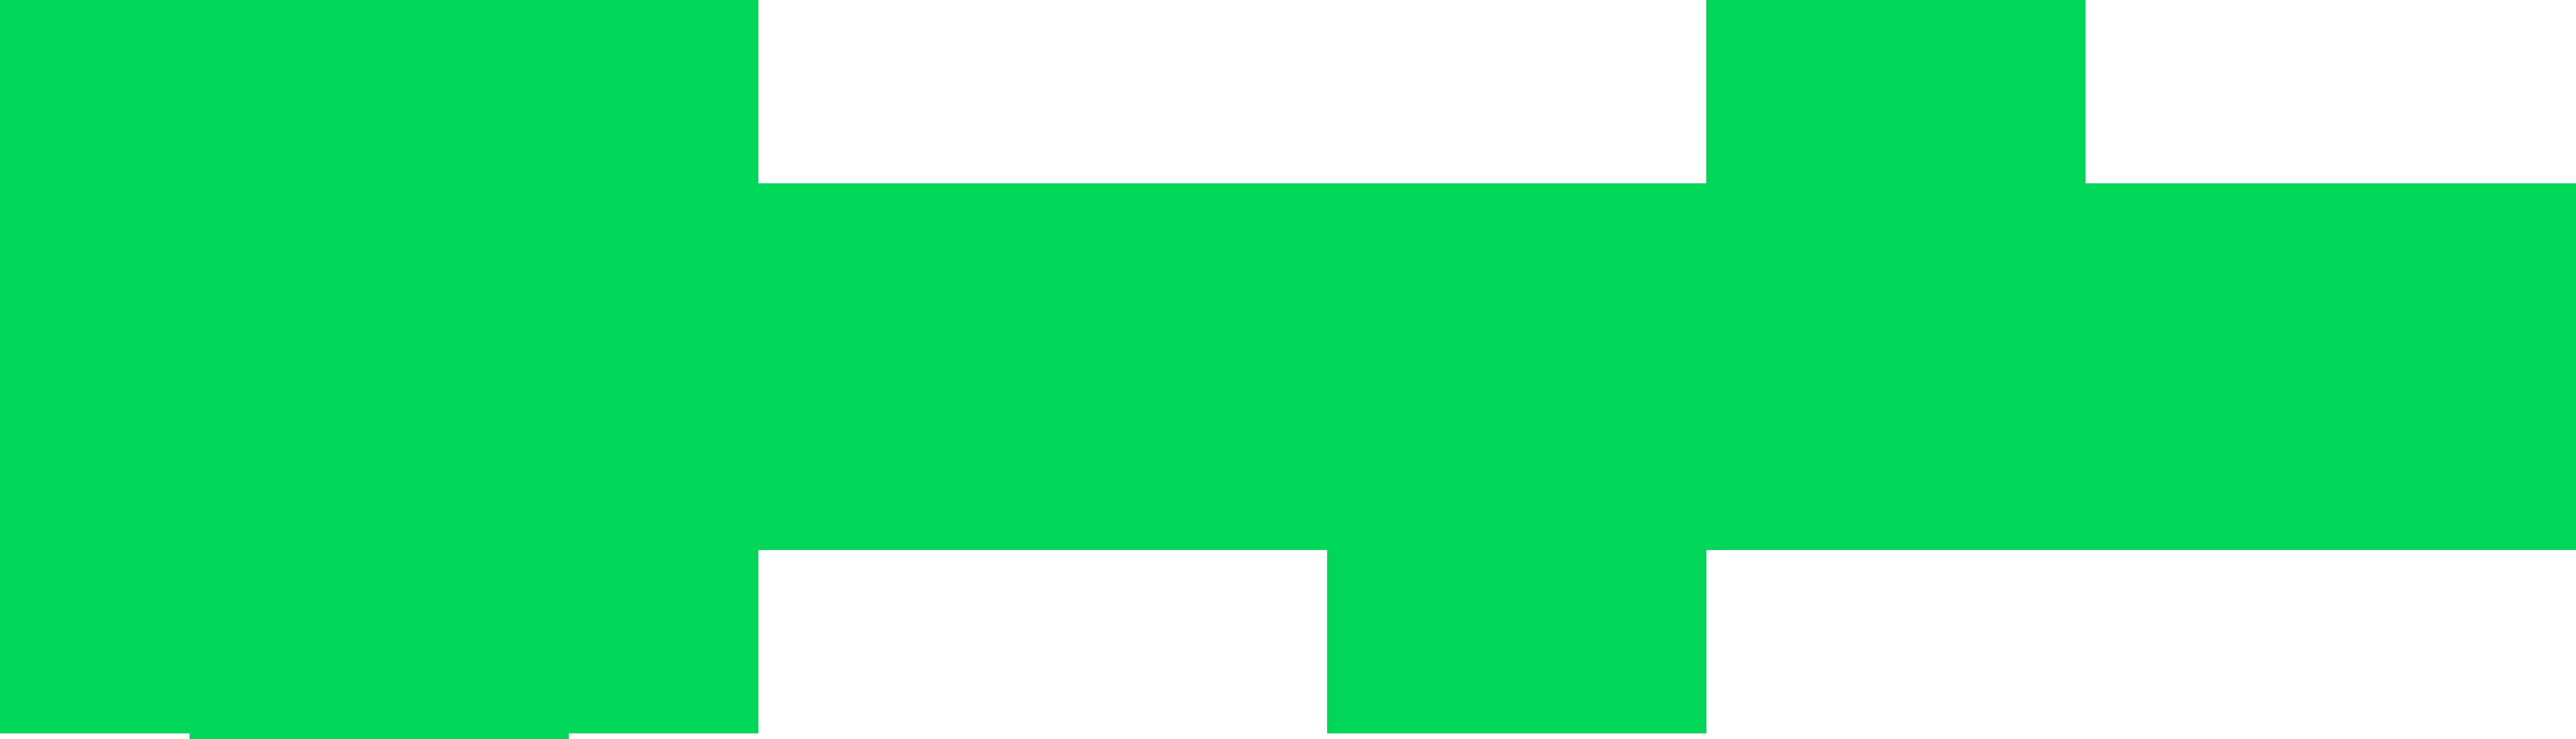 Aspire Logo Green